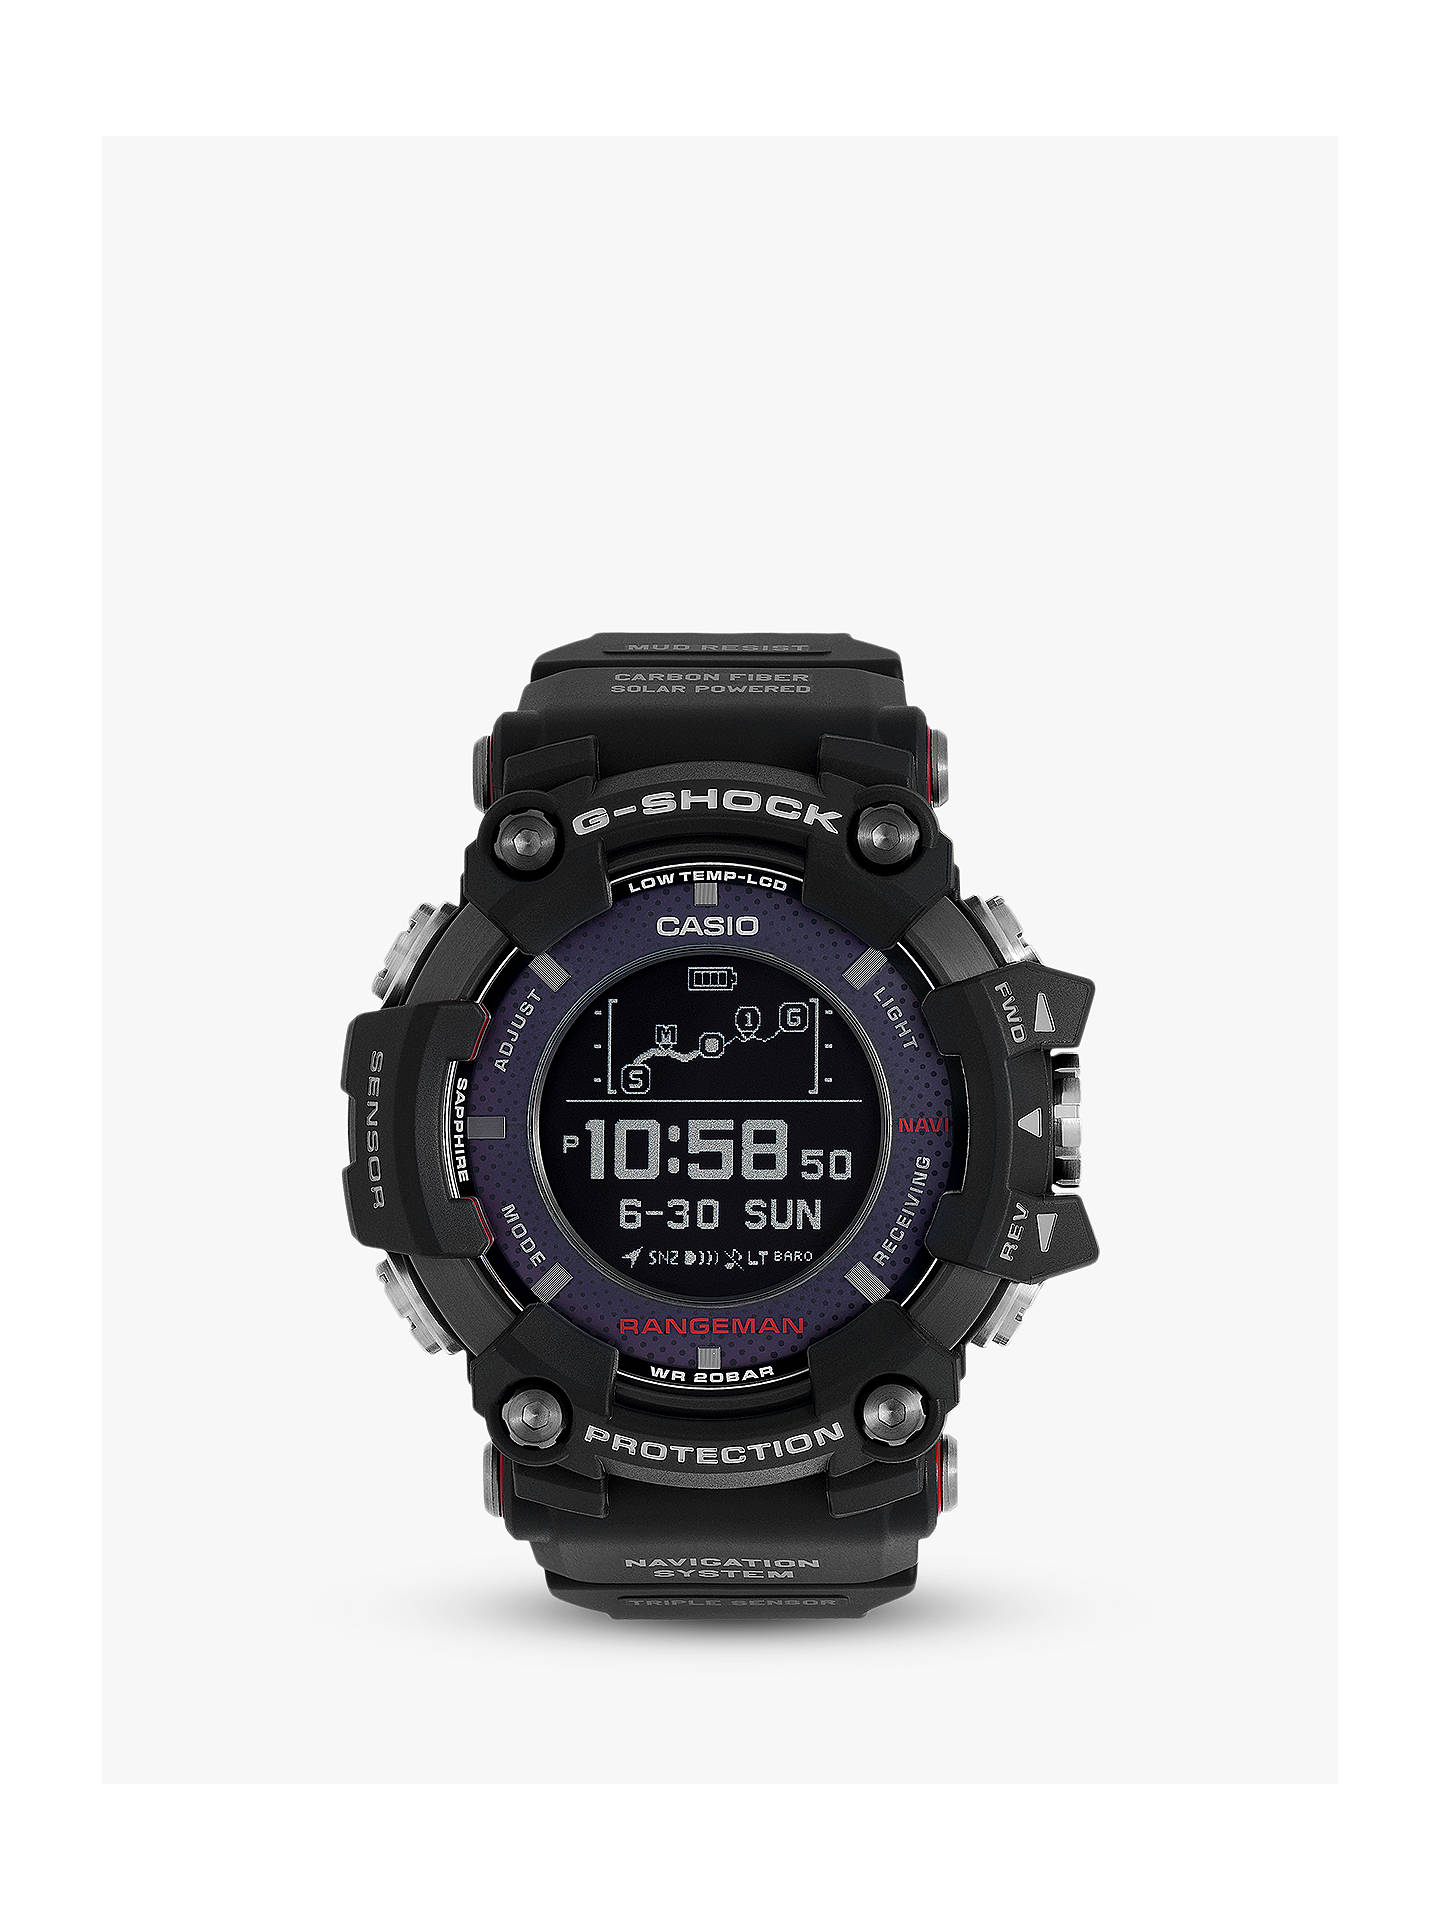 BuyCasio GPR-B1000-1ER Men s G-Shock Rangeman Solar GPS Resin Strap Watch e9701ae2f005